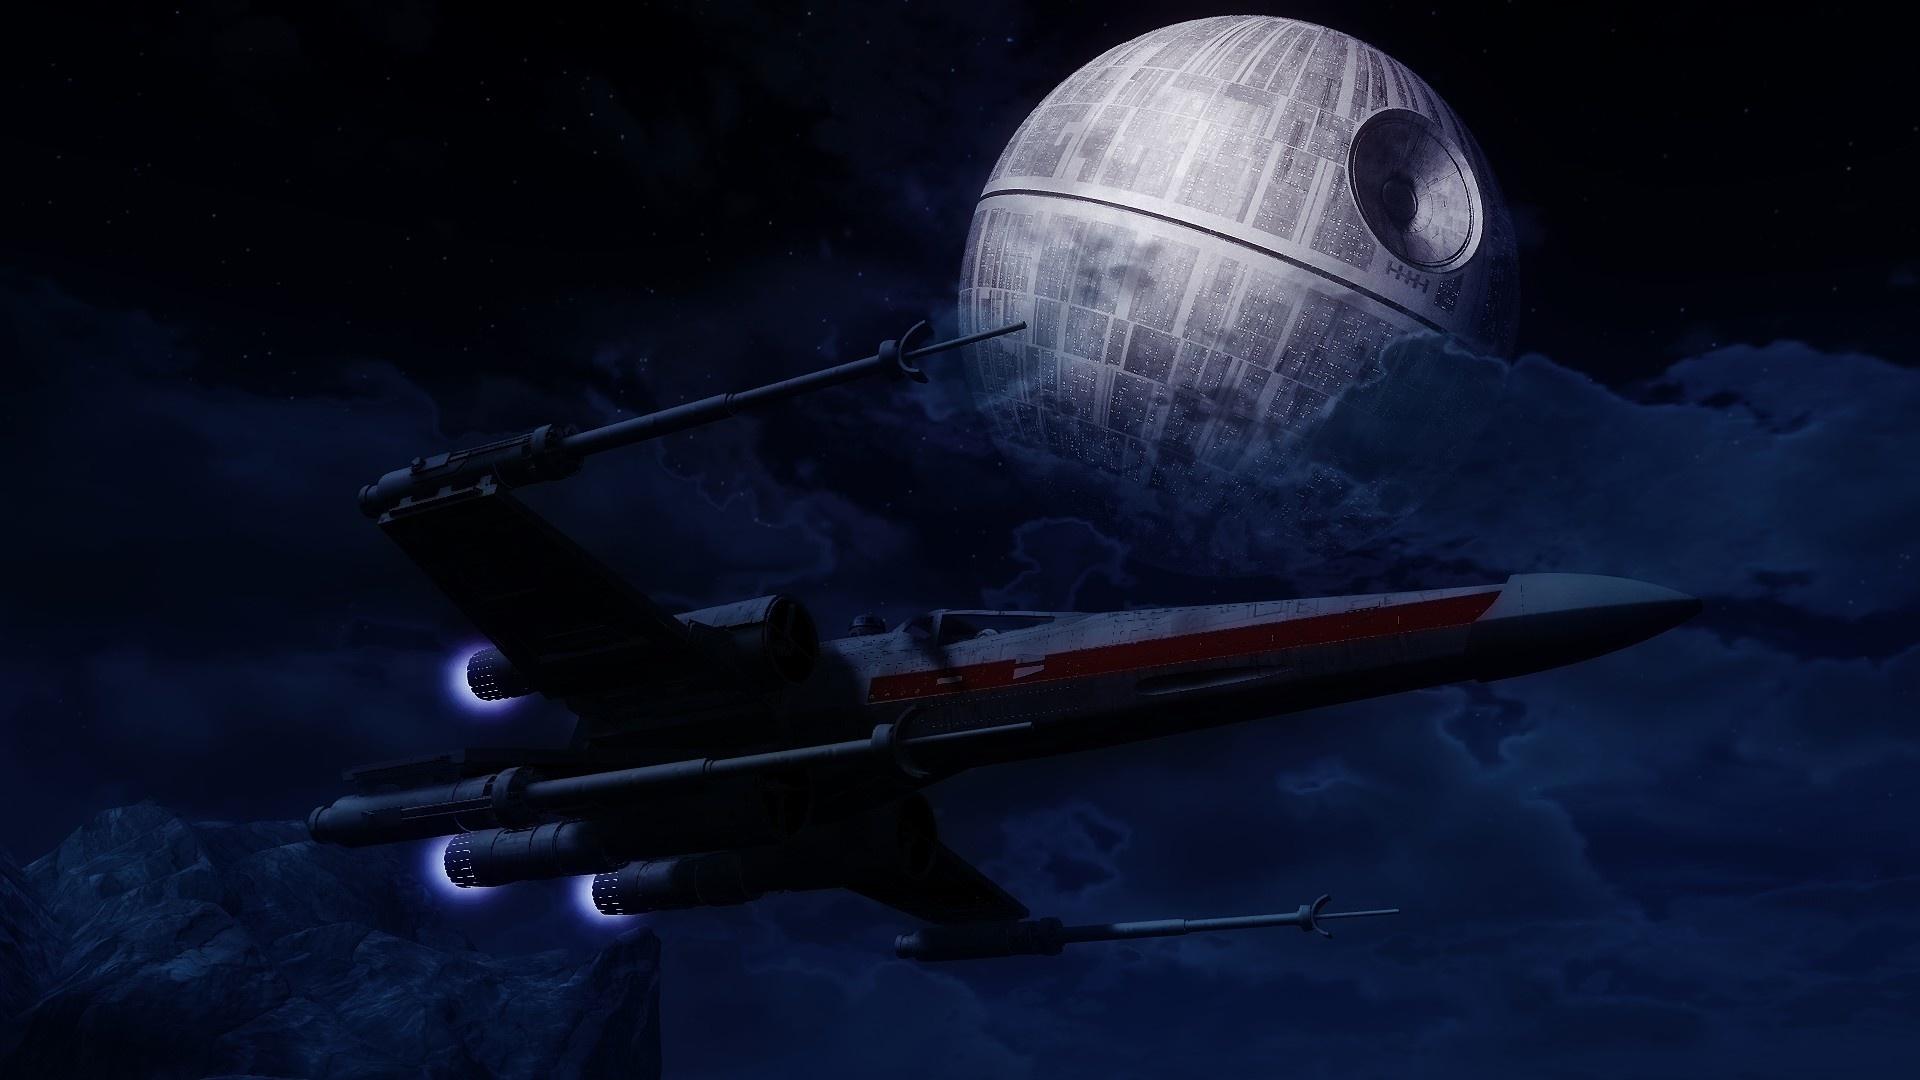 Star Wars free wallpaper